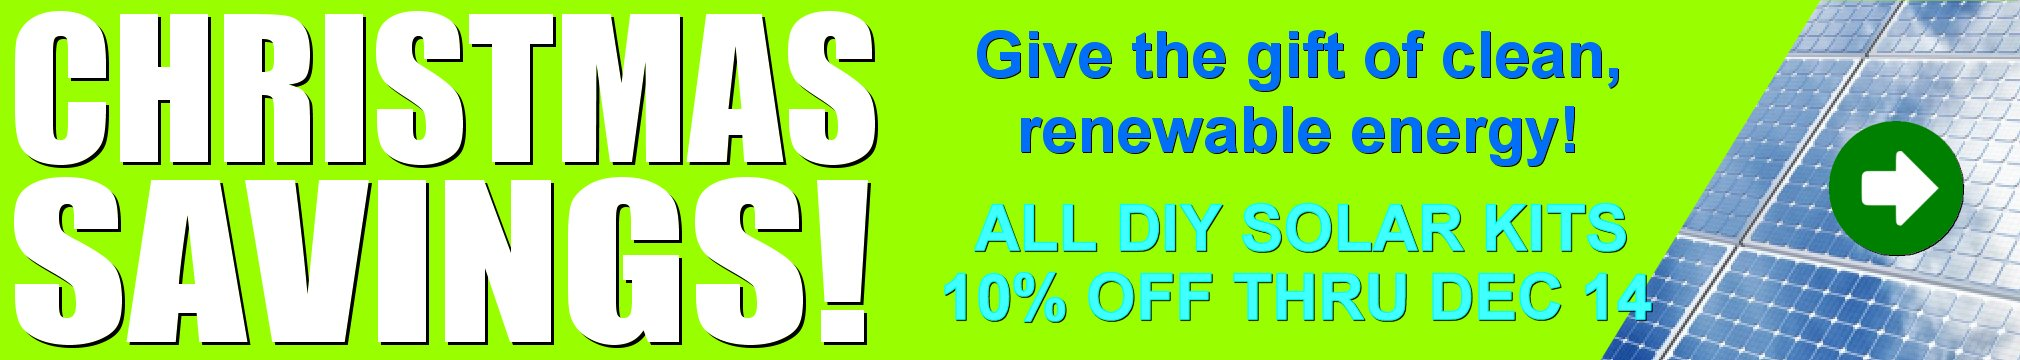 Christmas savings! All DIY Solar Kits 10% Off Thru Dec 14